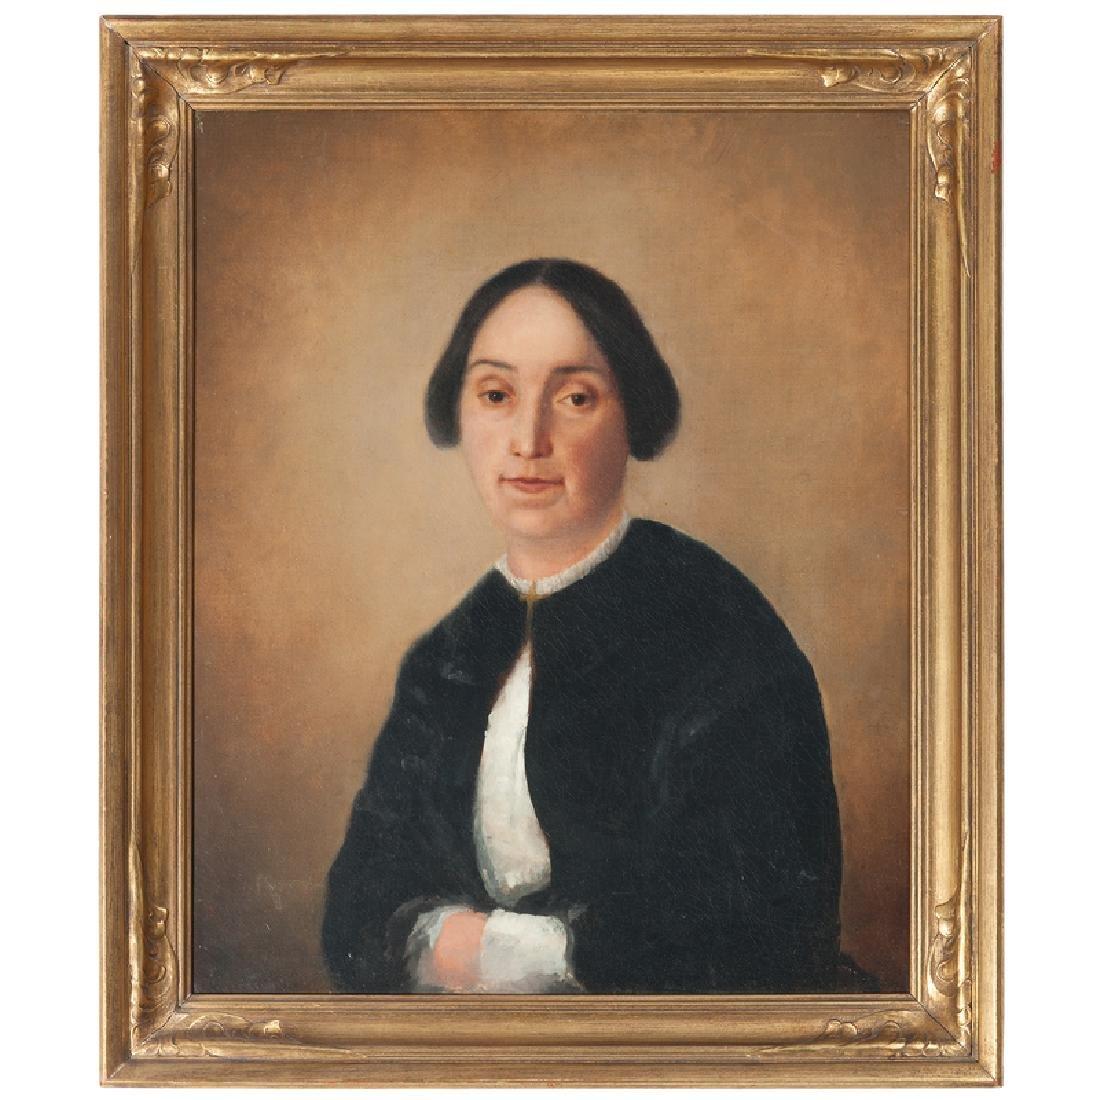 American Portrait of a Woman